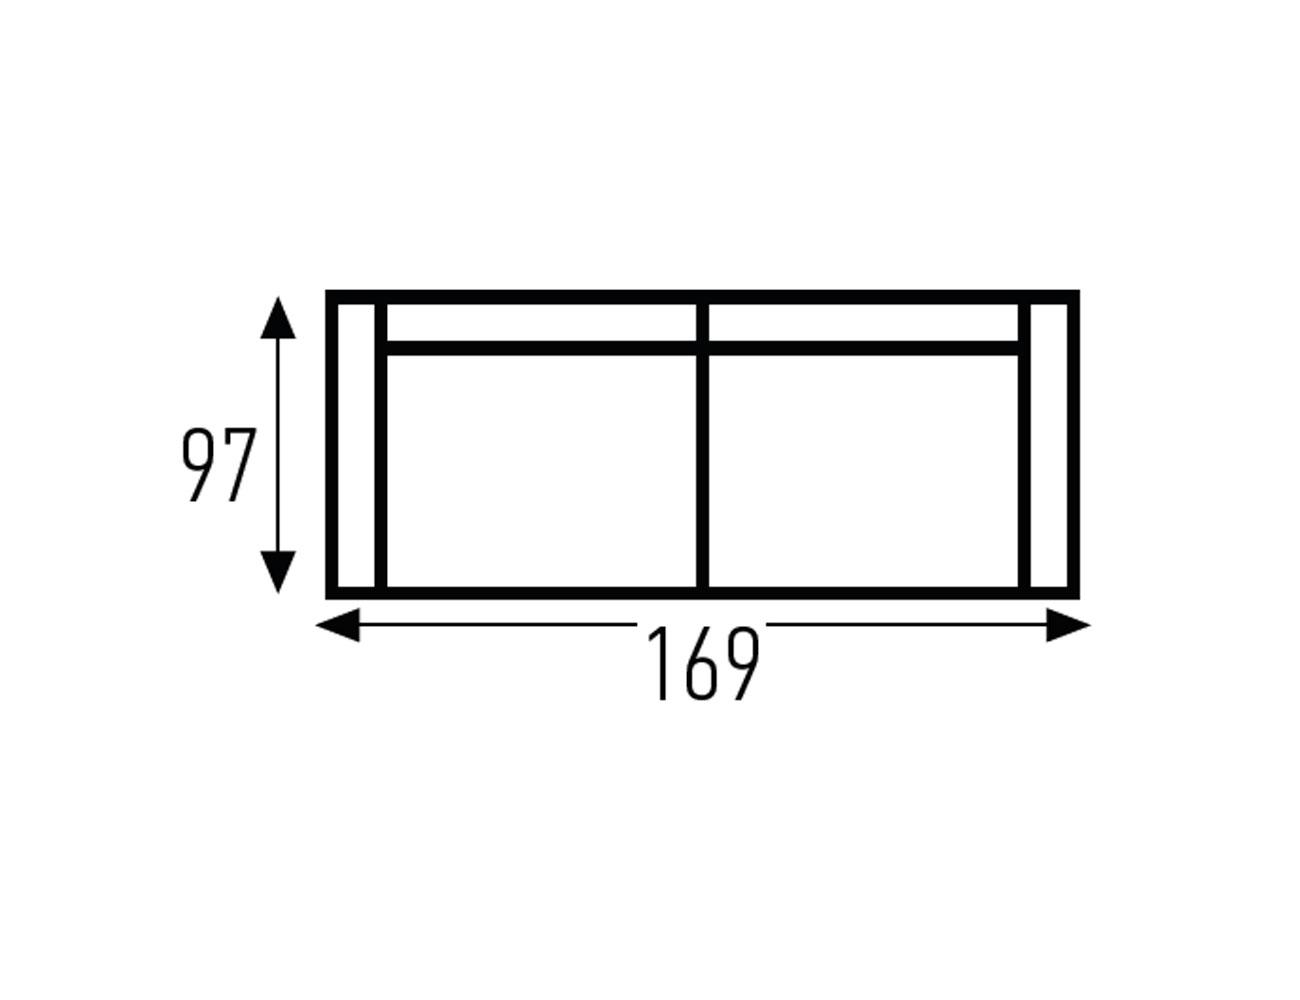 Croquis sofa 3 plaza 1692